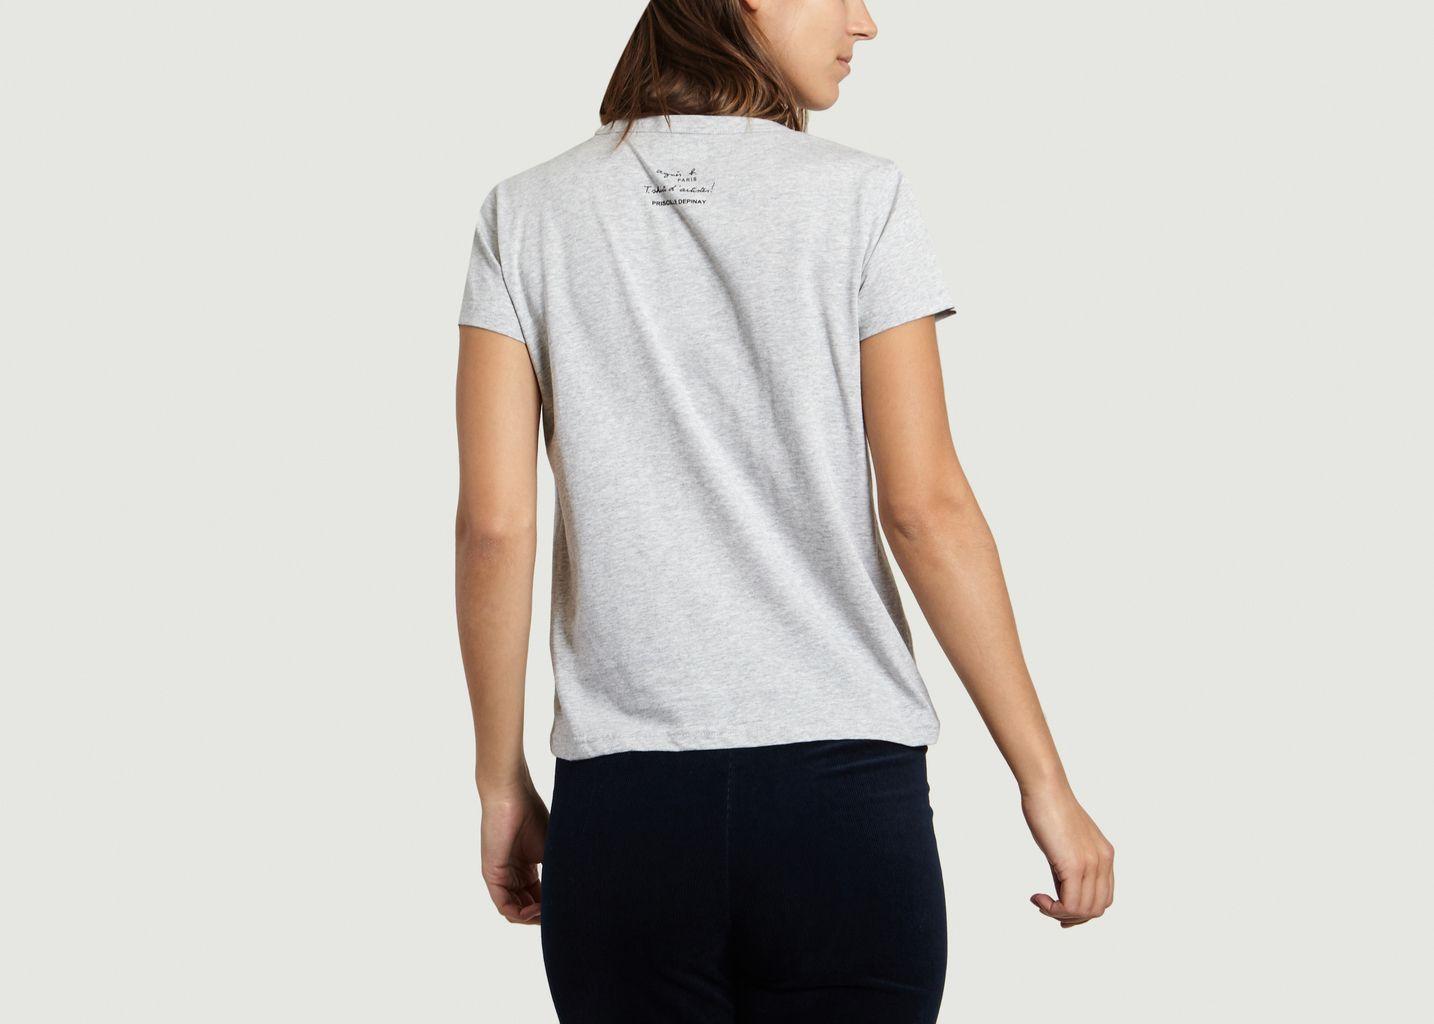 T-shirt Priscille Depinay - agnès b.